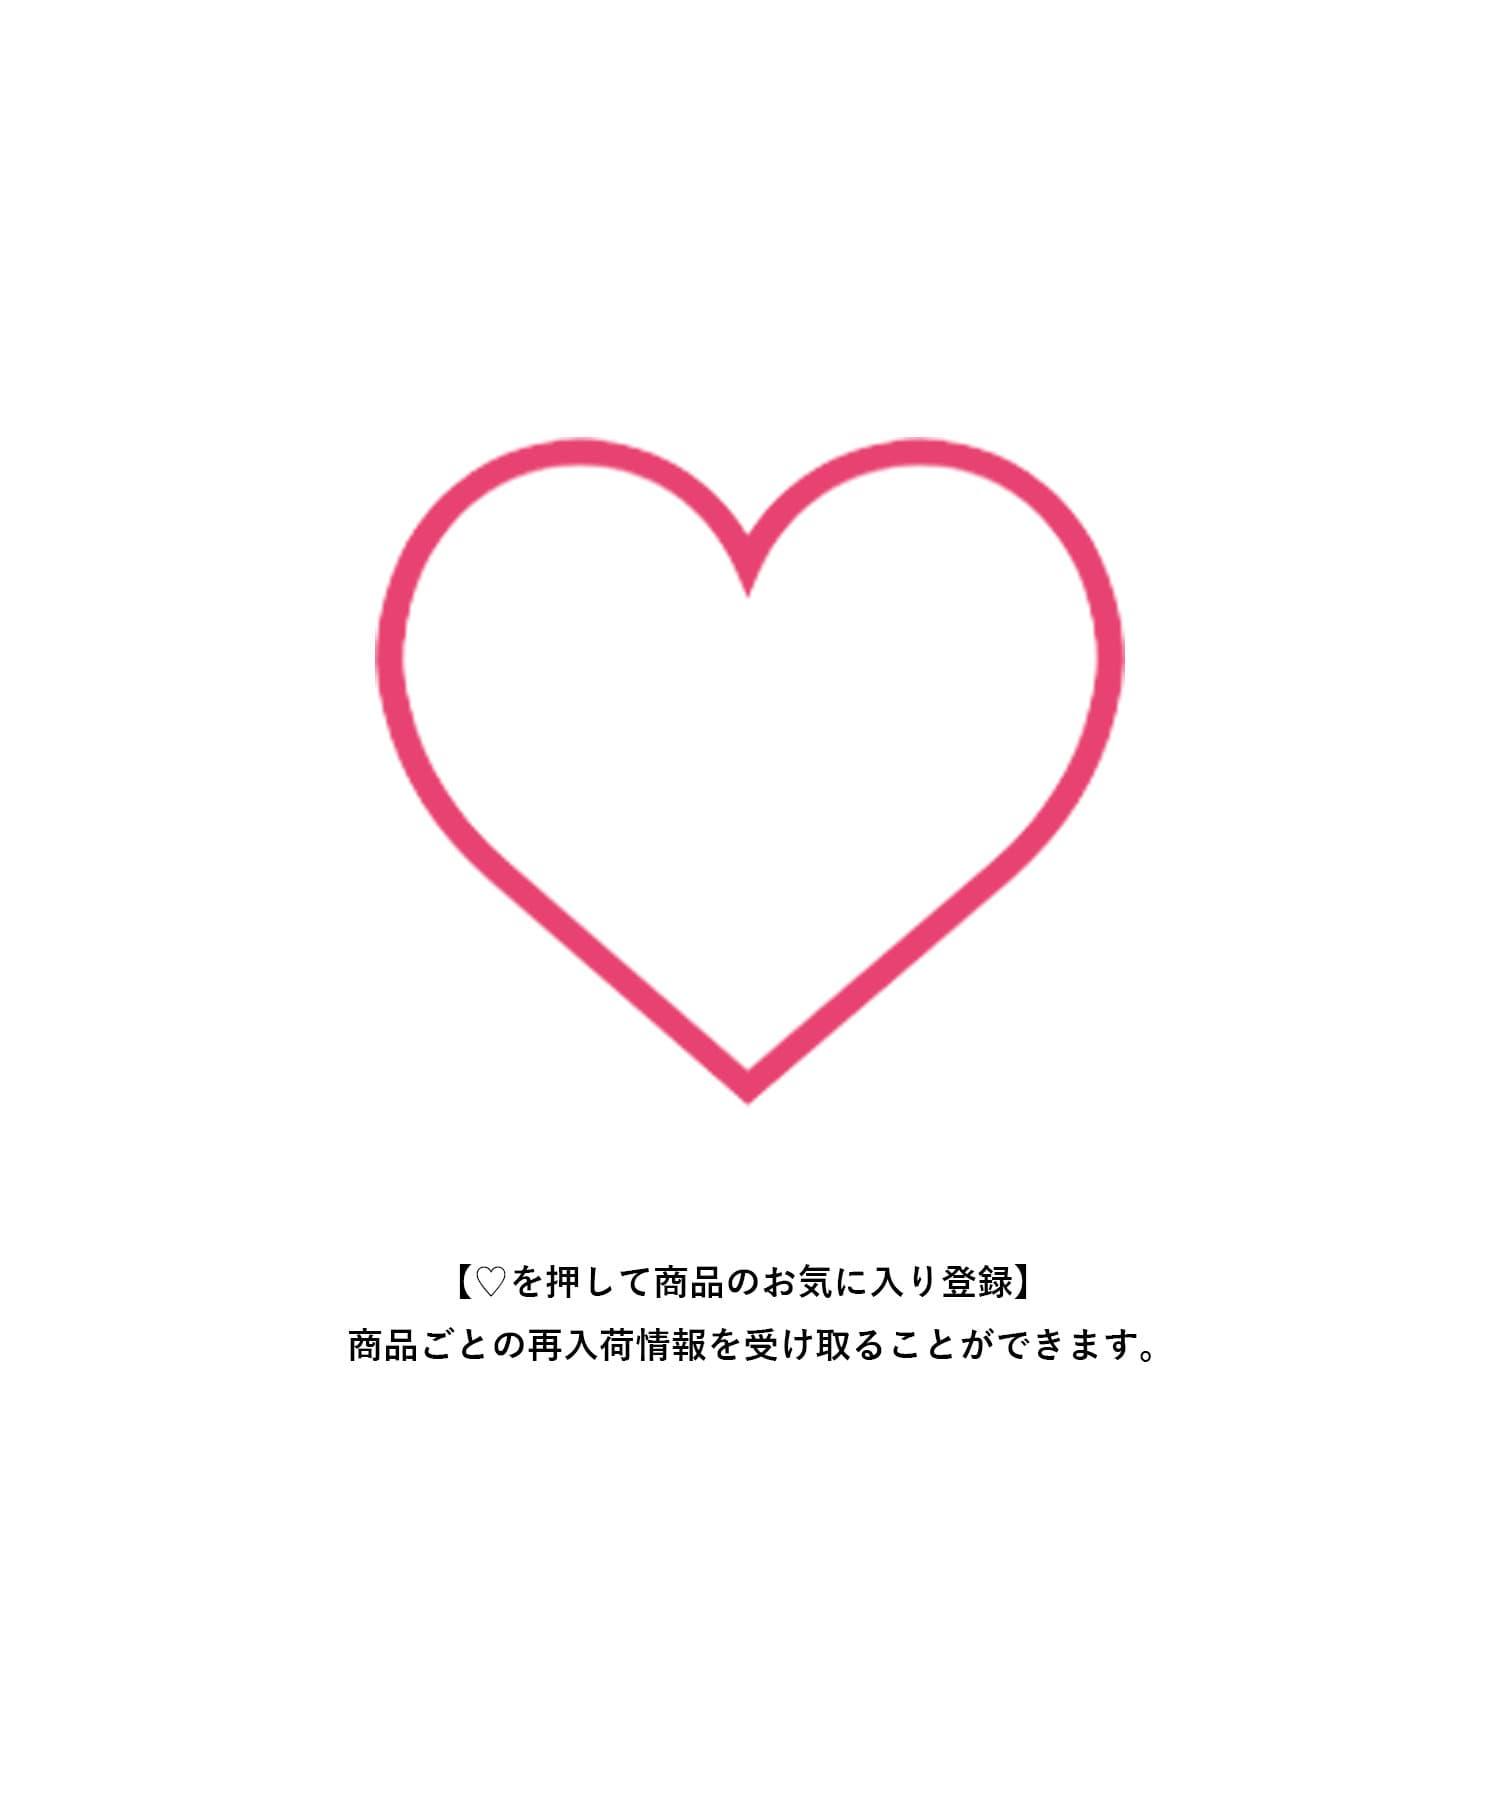 COLLAGE GALLARDAGALANTE(コラージュ ガリャルダガランテ) 【PAPILLONNER】ギャザーフラットパンプス